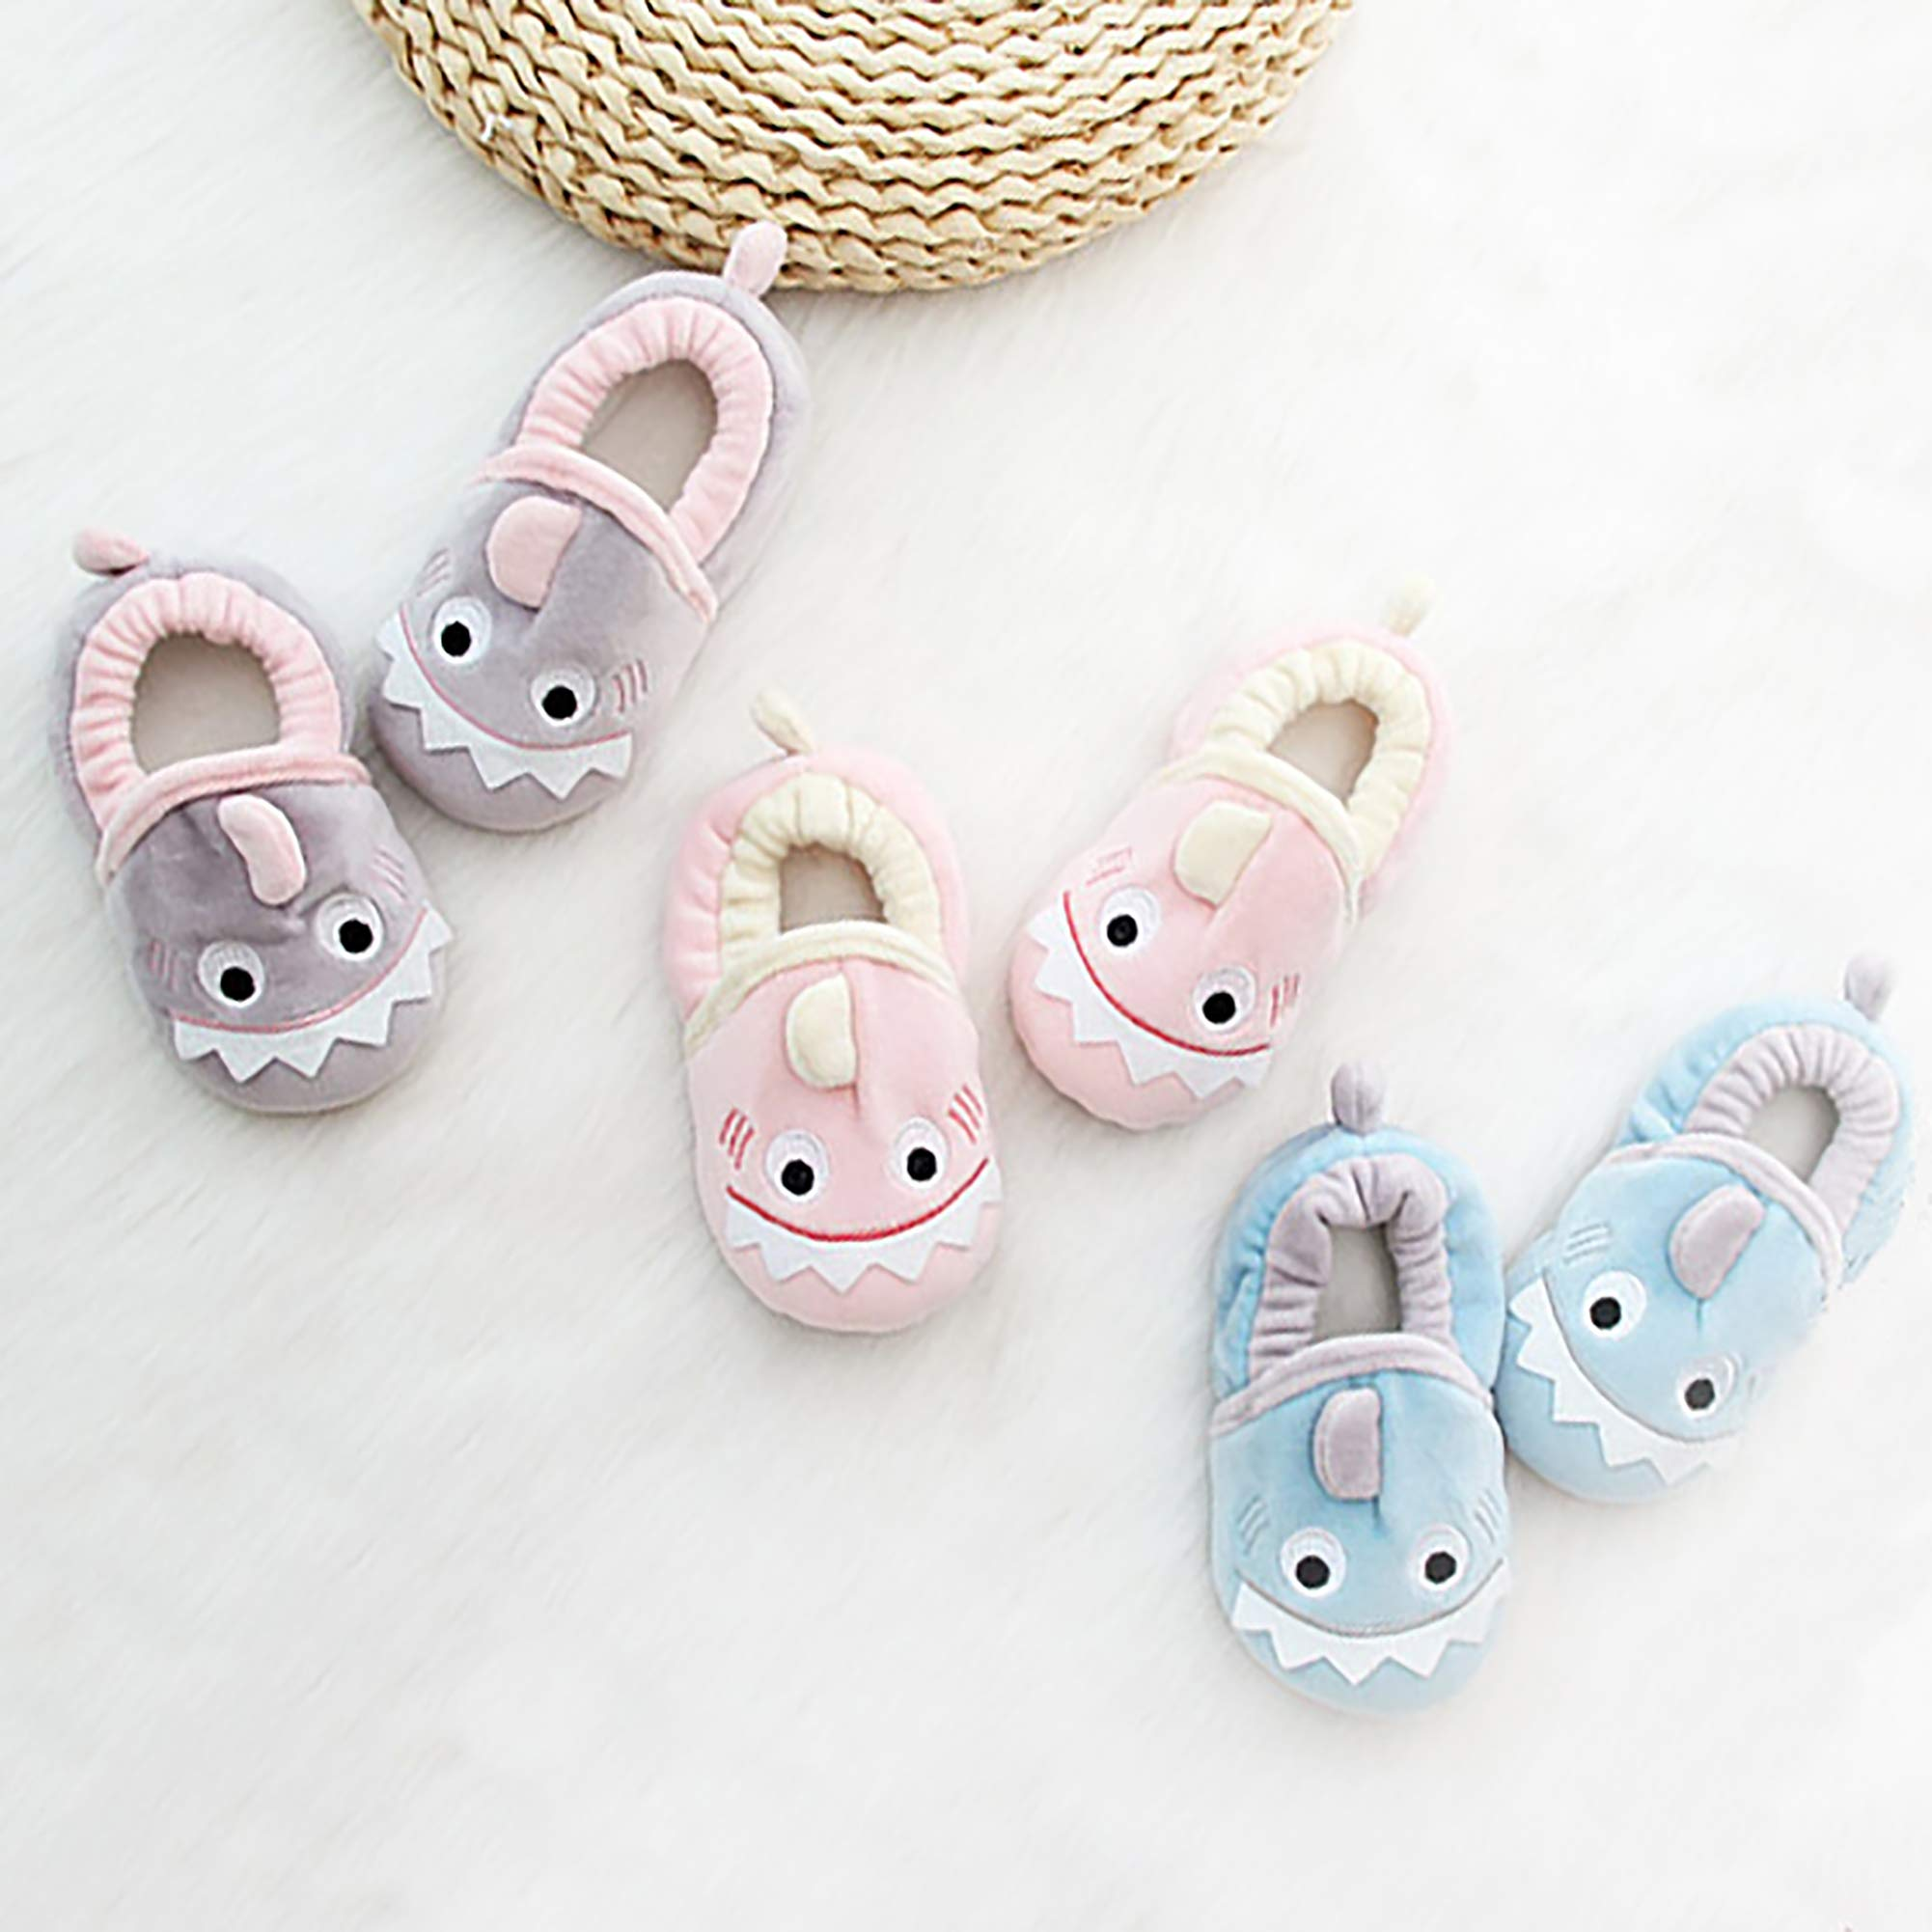 SDBING Toddler Baby Boys Girls Cute Cartoon Shark Shoes Soft Anti-slip Winter Home Slippers 6-24 Months (12-18 Months, Cute Shark Pink) by SDBING (Image #6)